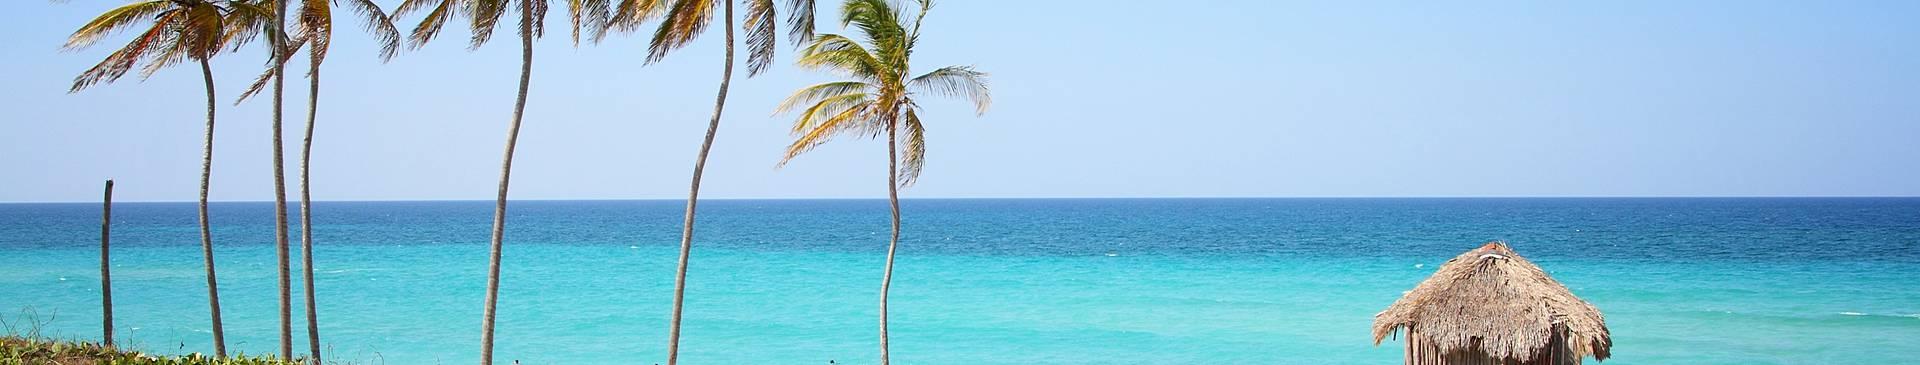 Strand und Meer Kuba Reisen